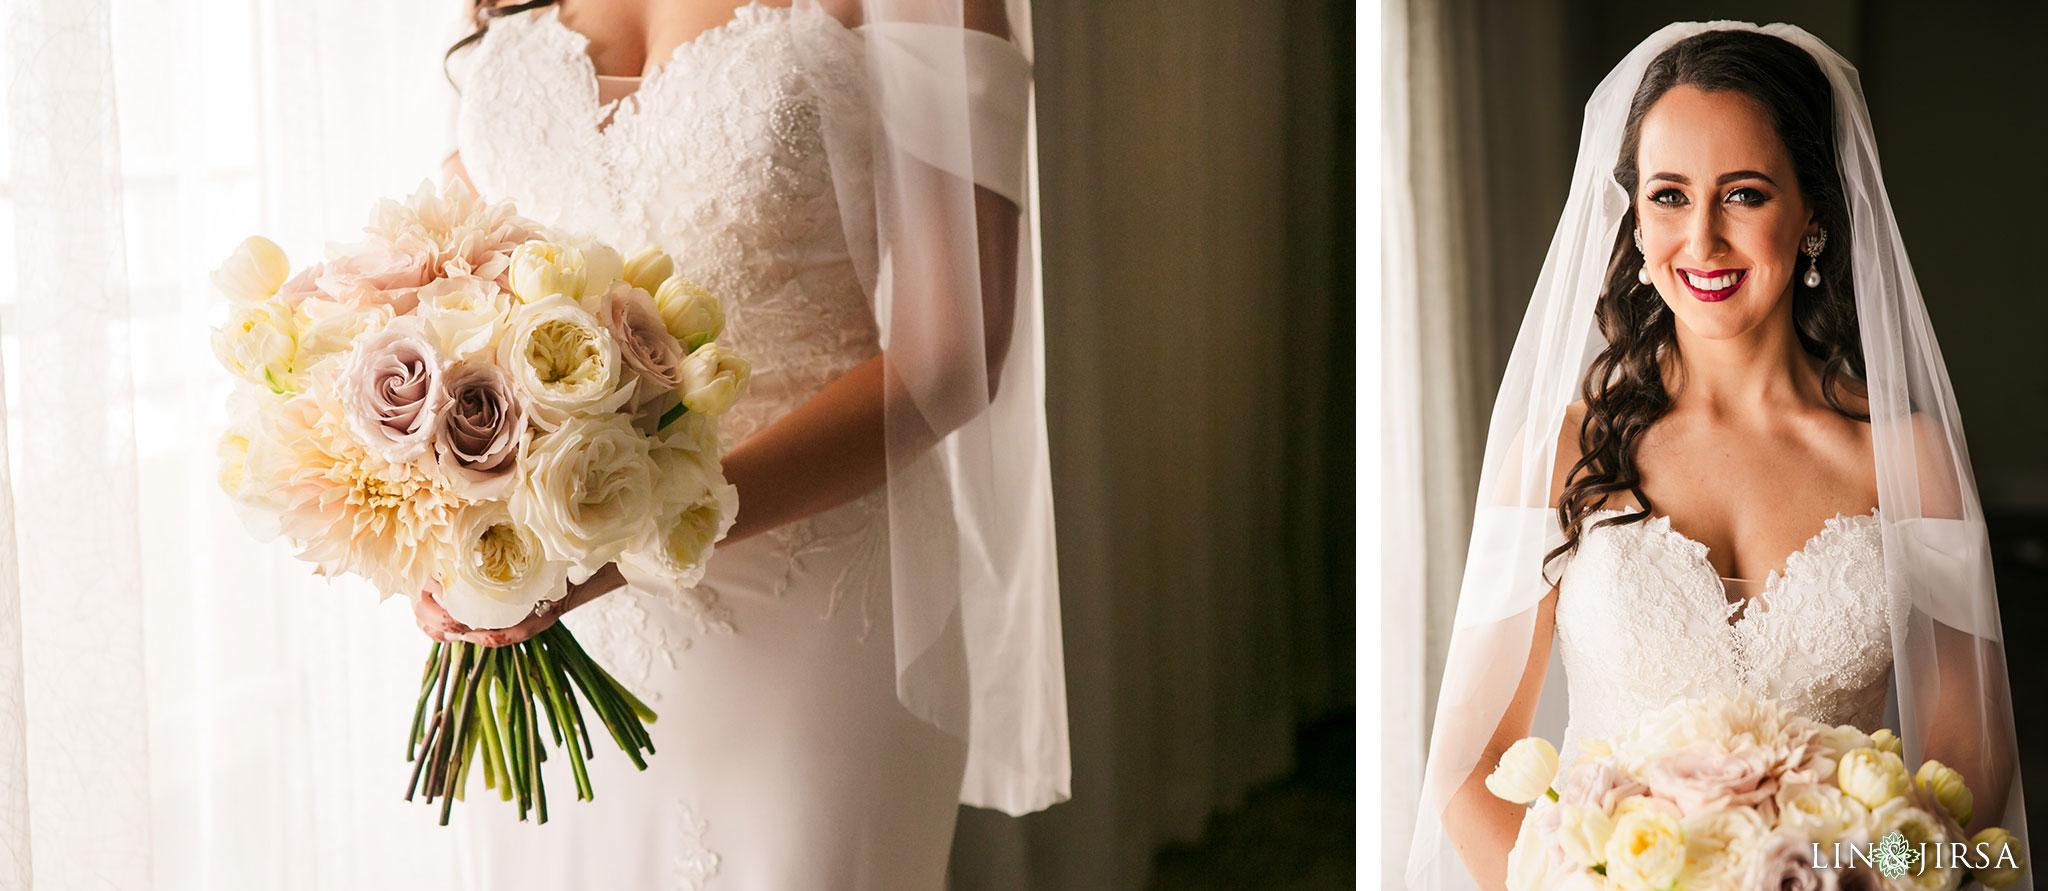 027 ritz carlton laguna niguel indian bride wedding photography